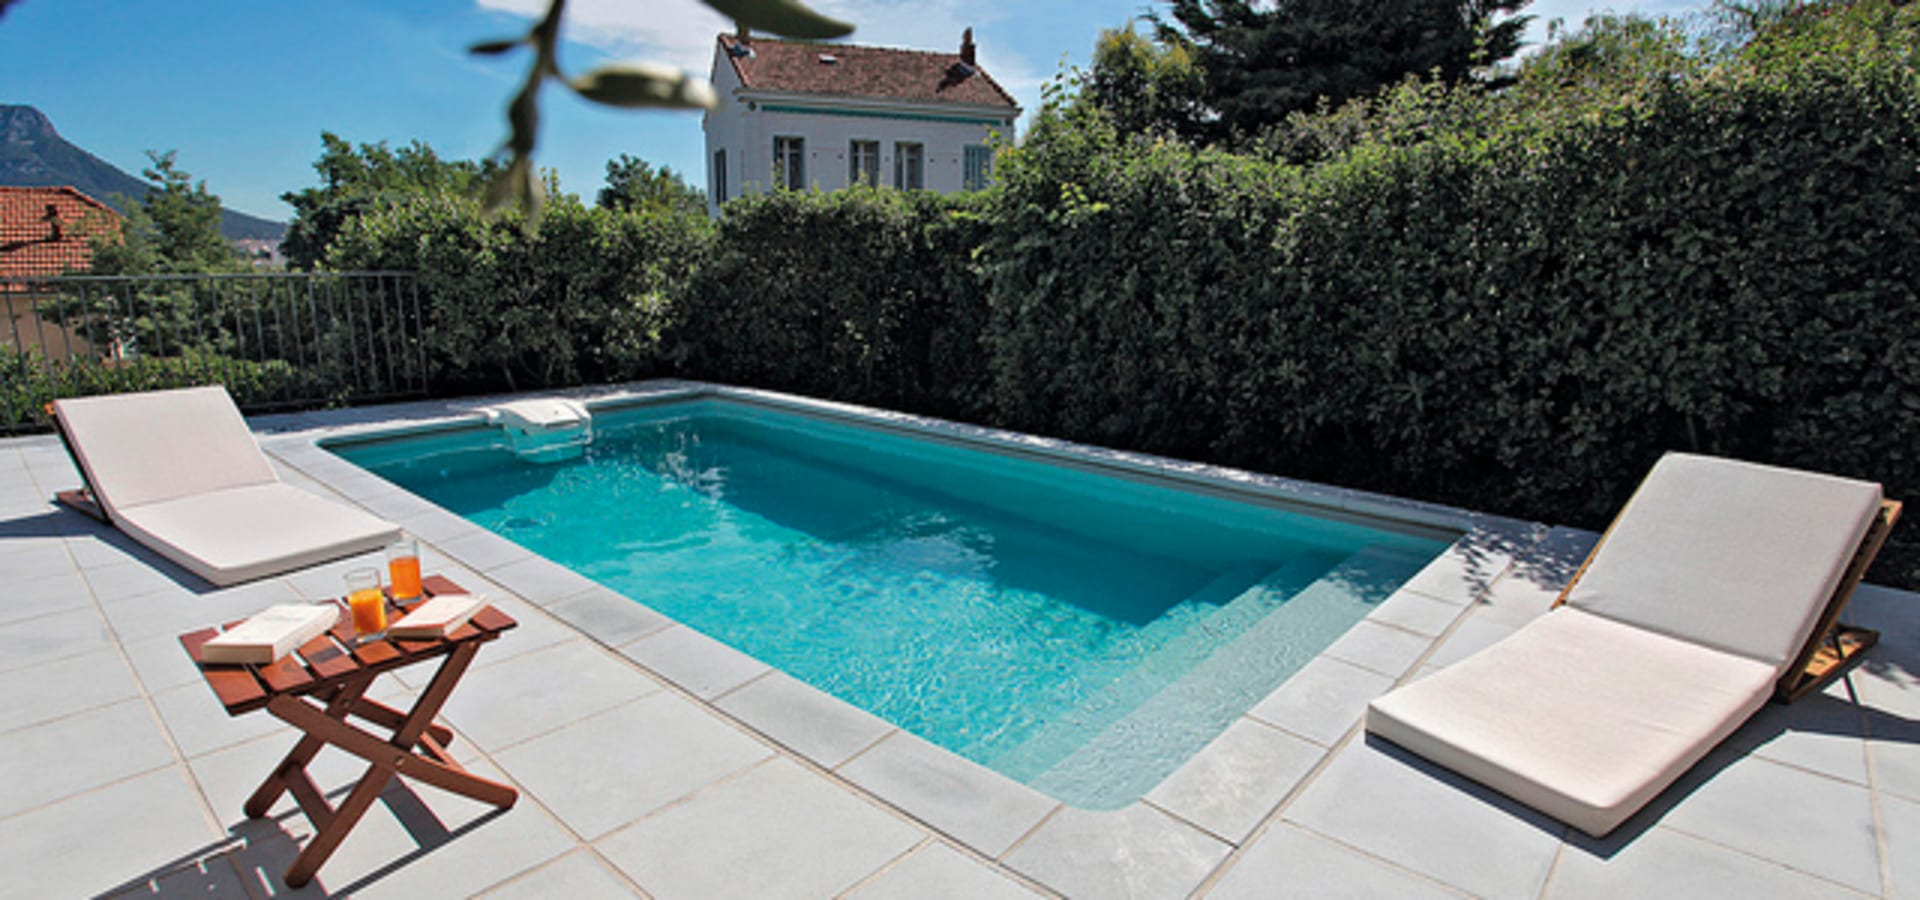 Piscina 6x3 desjoyaux by desjoyaux piscinas oeste homify for W piscinas